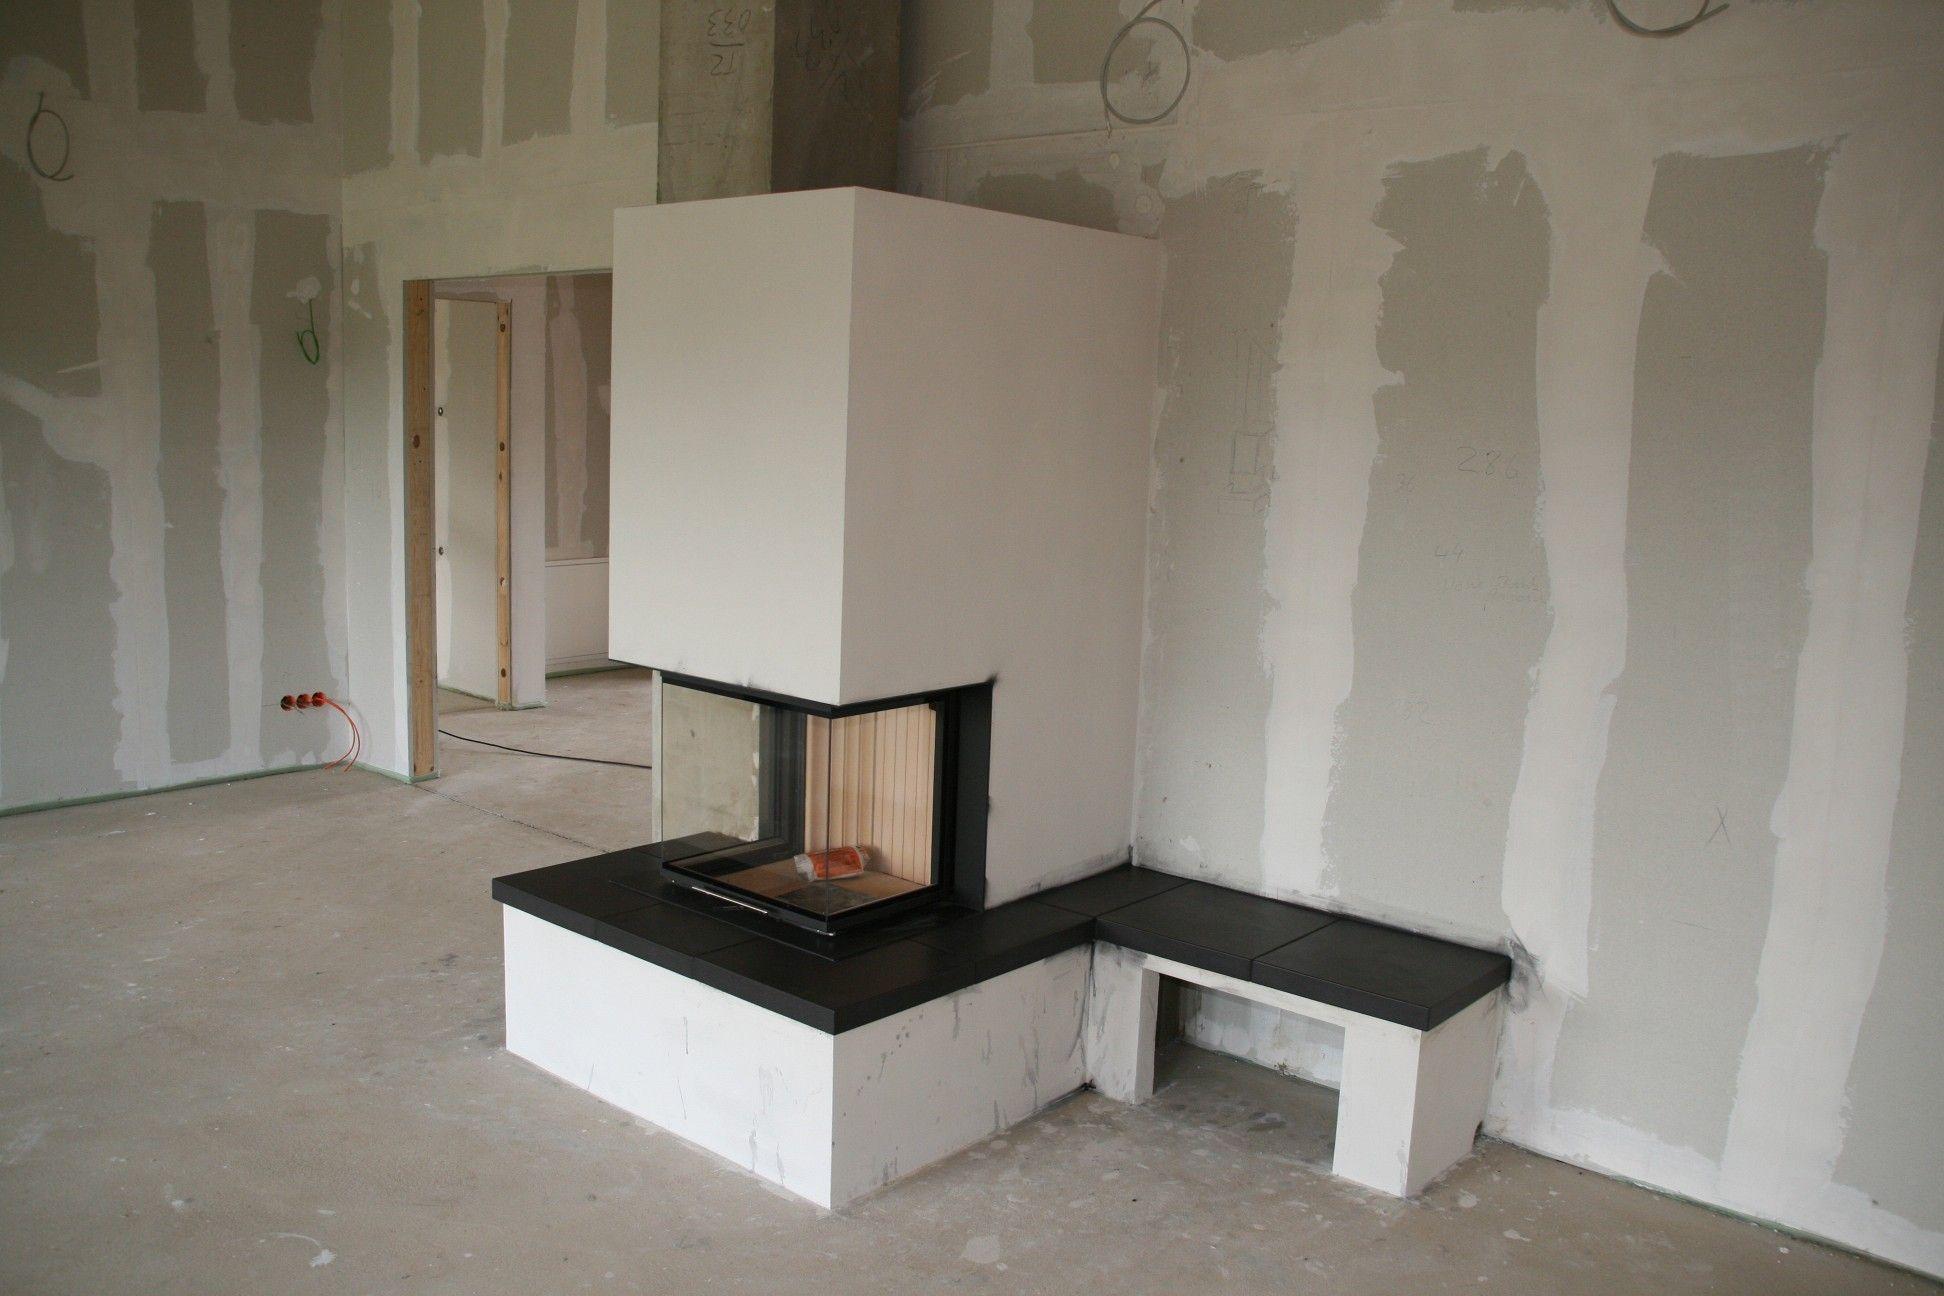 kamin inkl sitzbank bauvorhaben hering schellbach pinterest sitzbank kaminofen und ofen. Black Bedroom Furniture Sets. Home Design Ideas